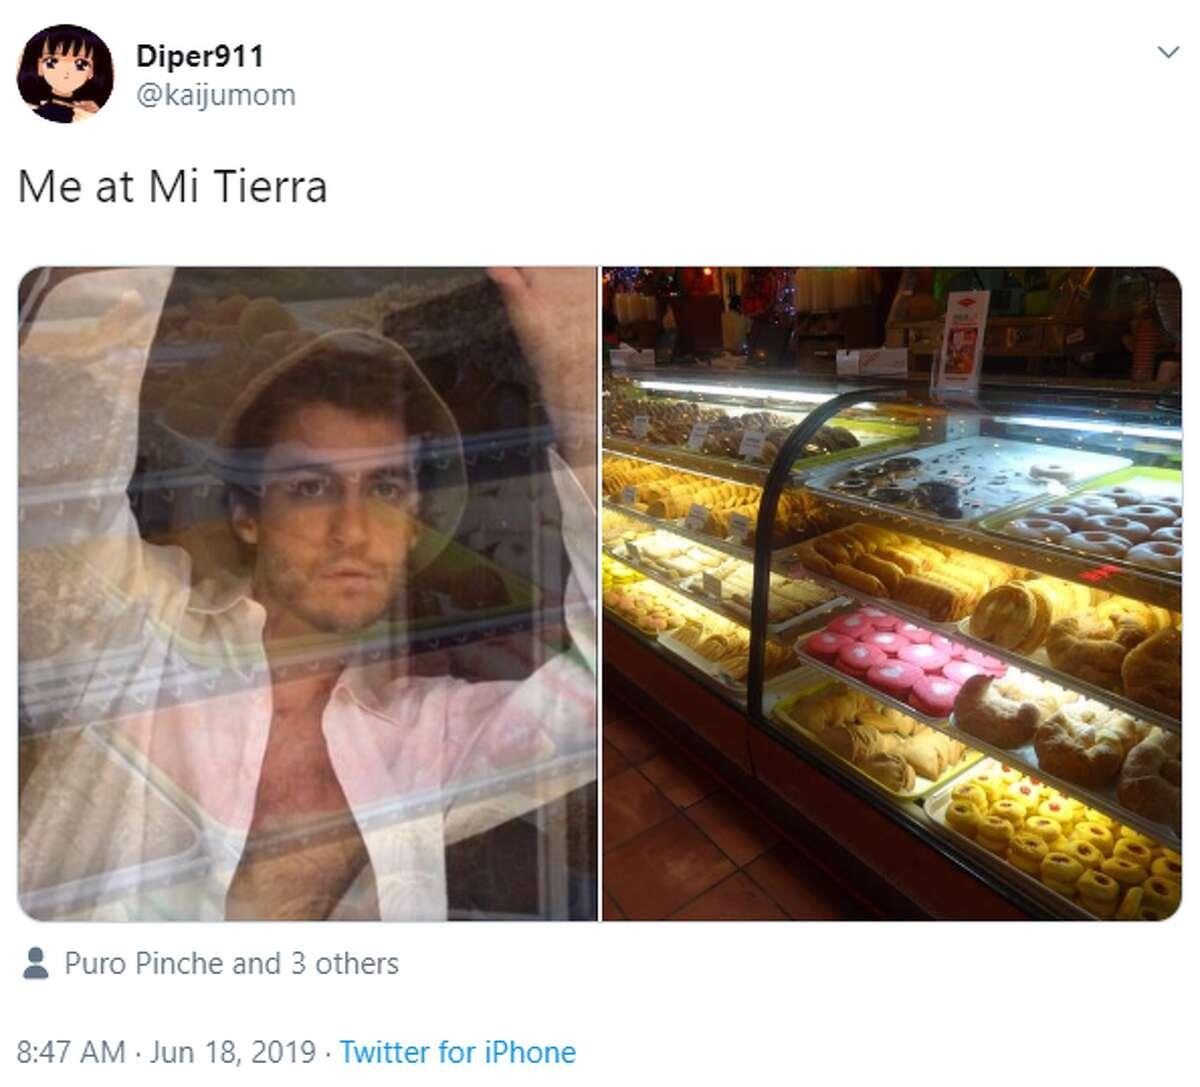 @kaijumom: Me at Mi Tierra